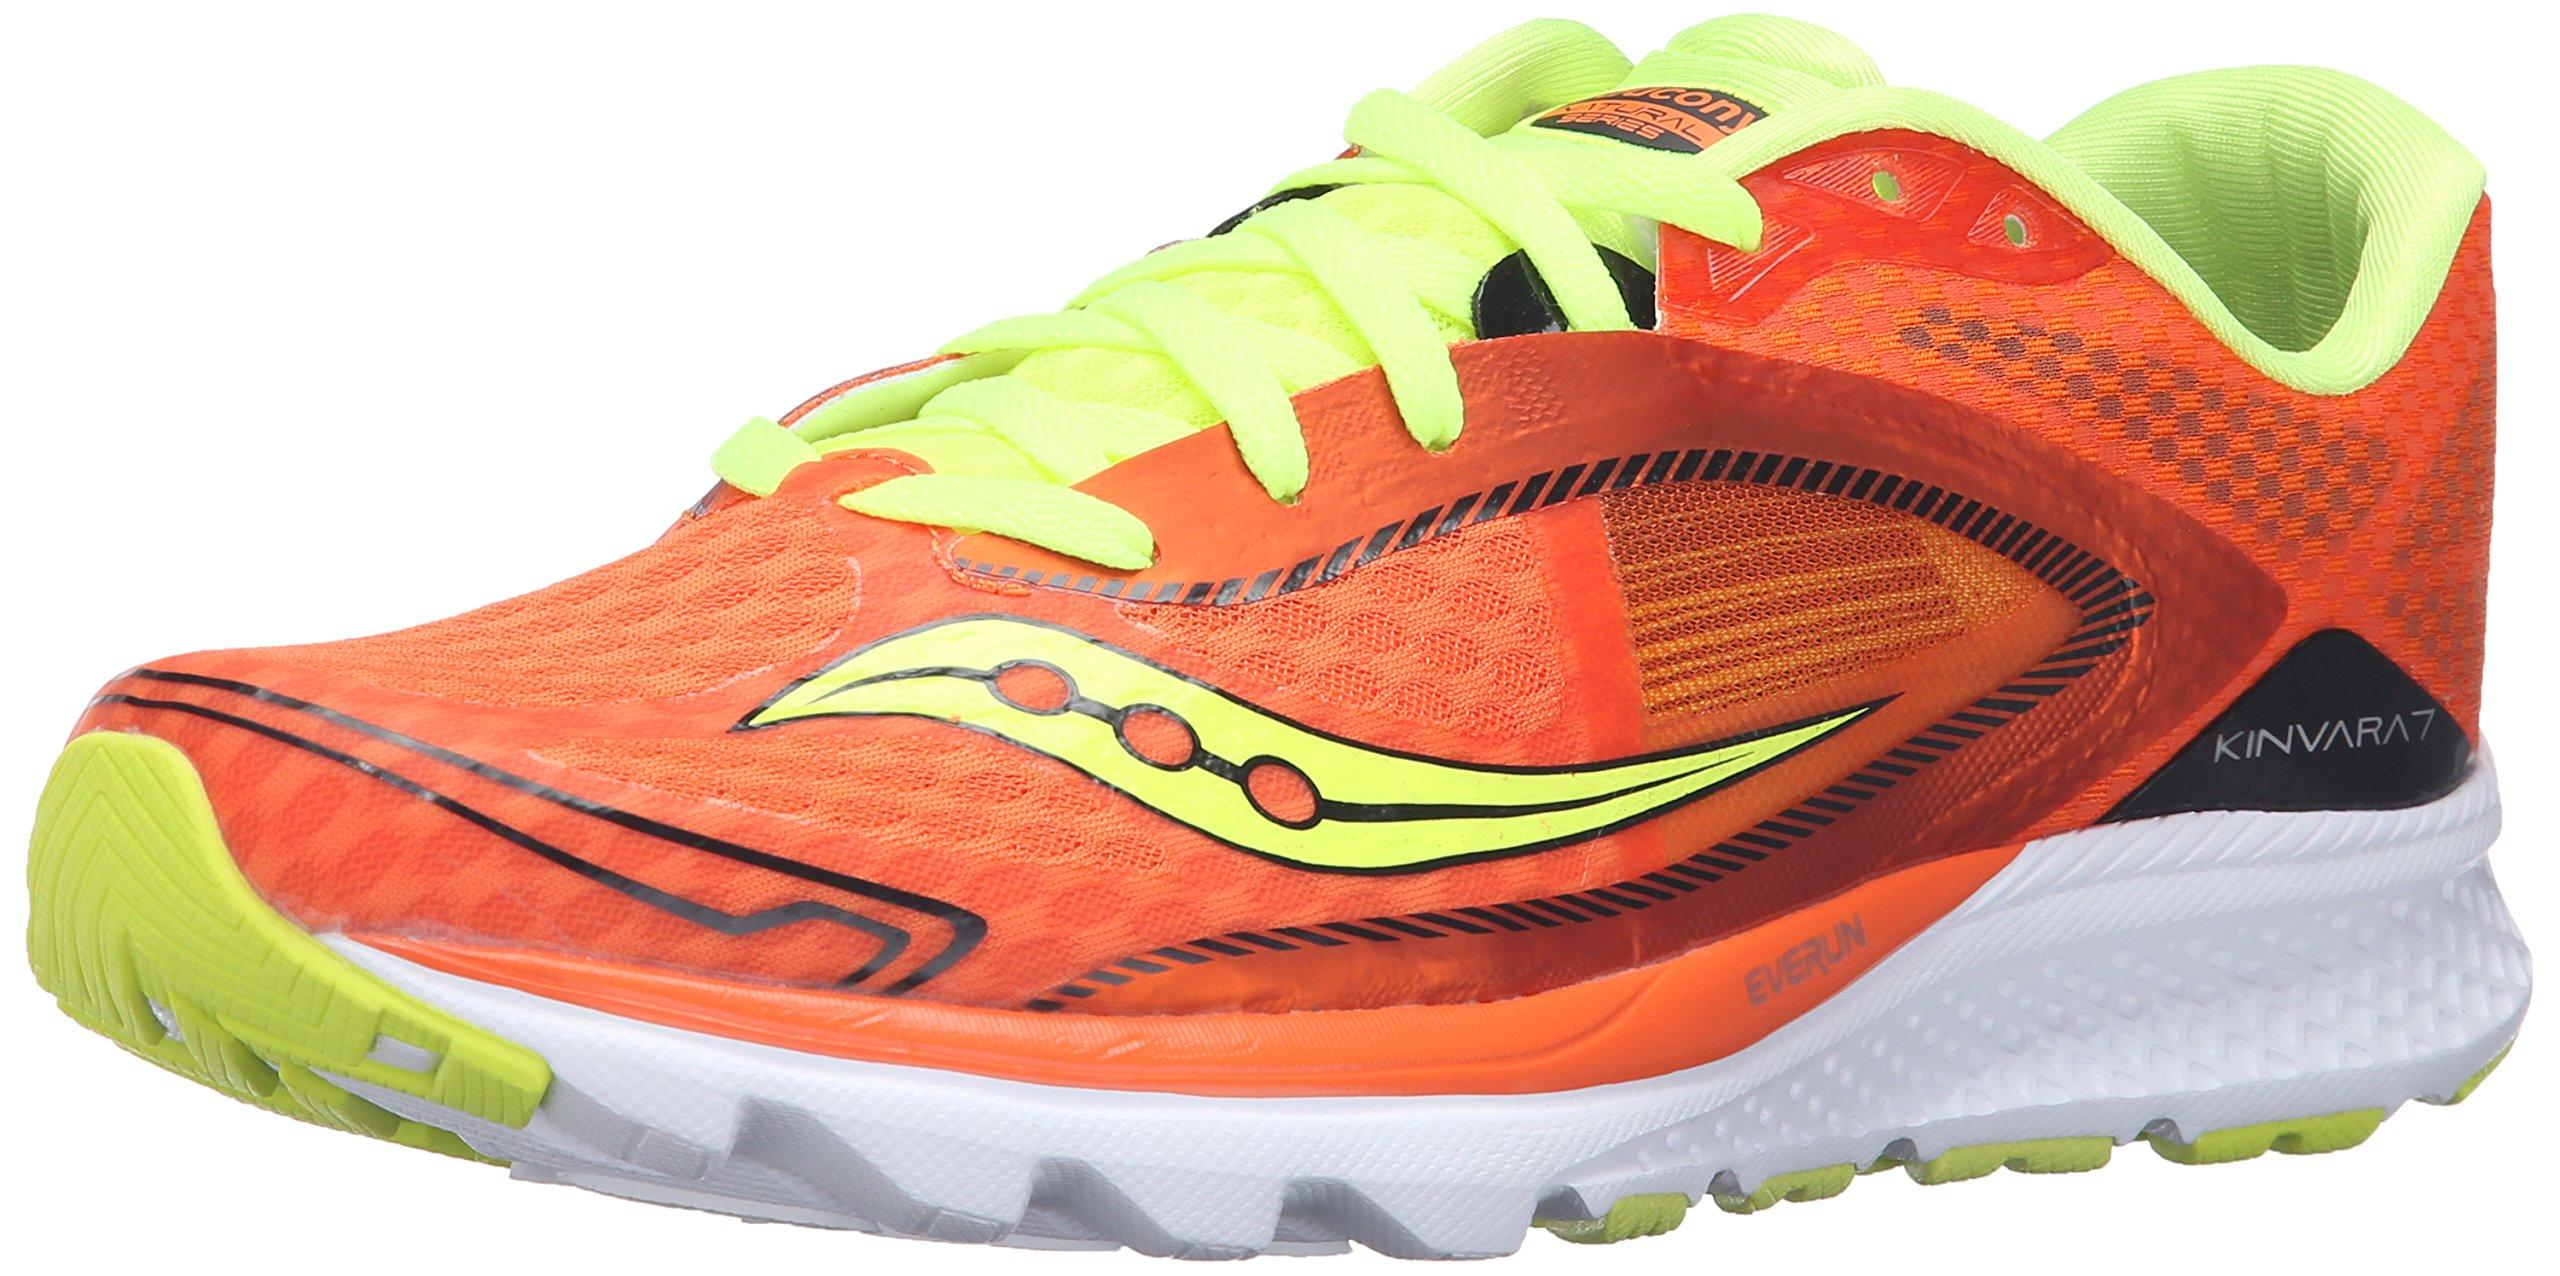 Saucony Men's Kinvara 7 Running Shoe, Orange/Cotton/Blue, 11 M US